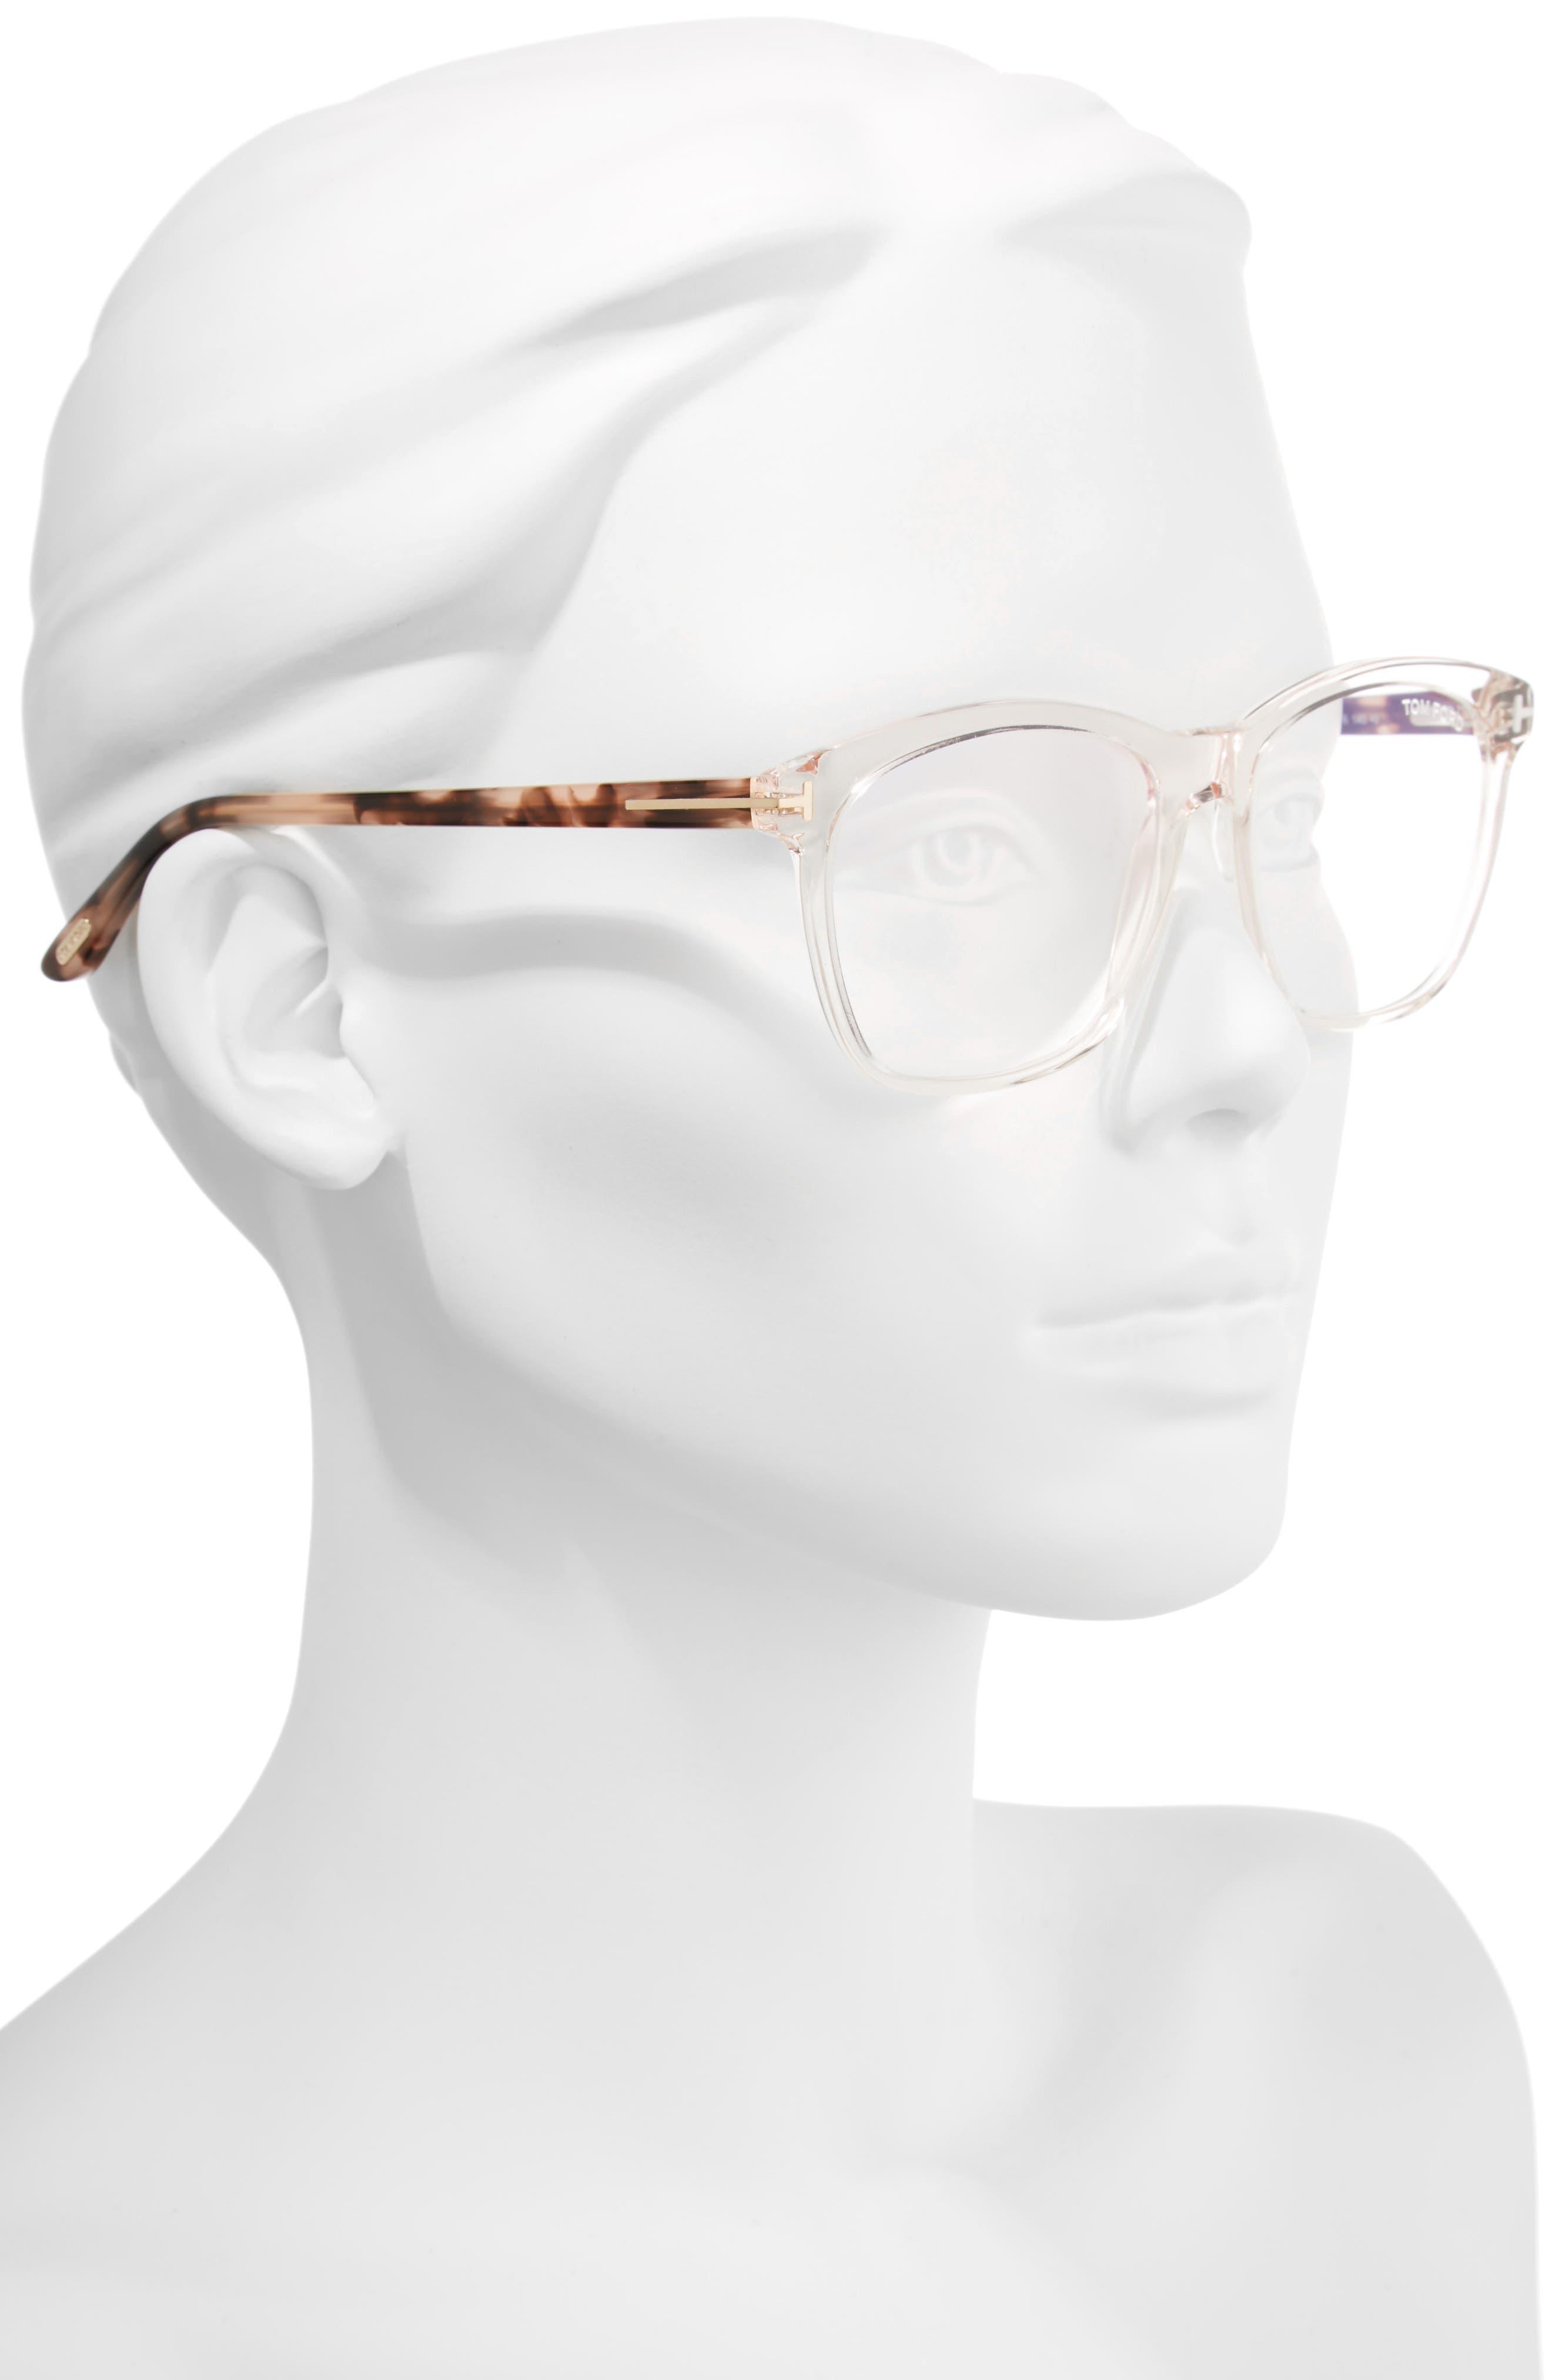 54mm Blue Block Optical Glasses,                             Alternate thumbnail 2, color,                             Shiny Pink/ Vintage Havana